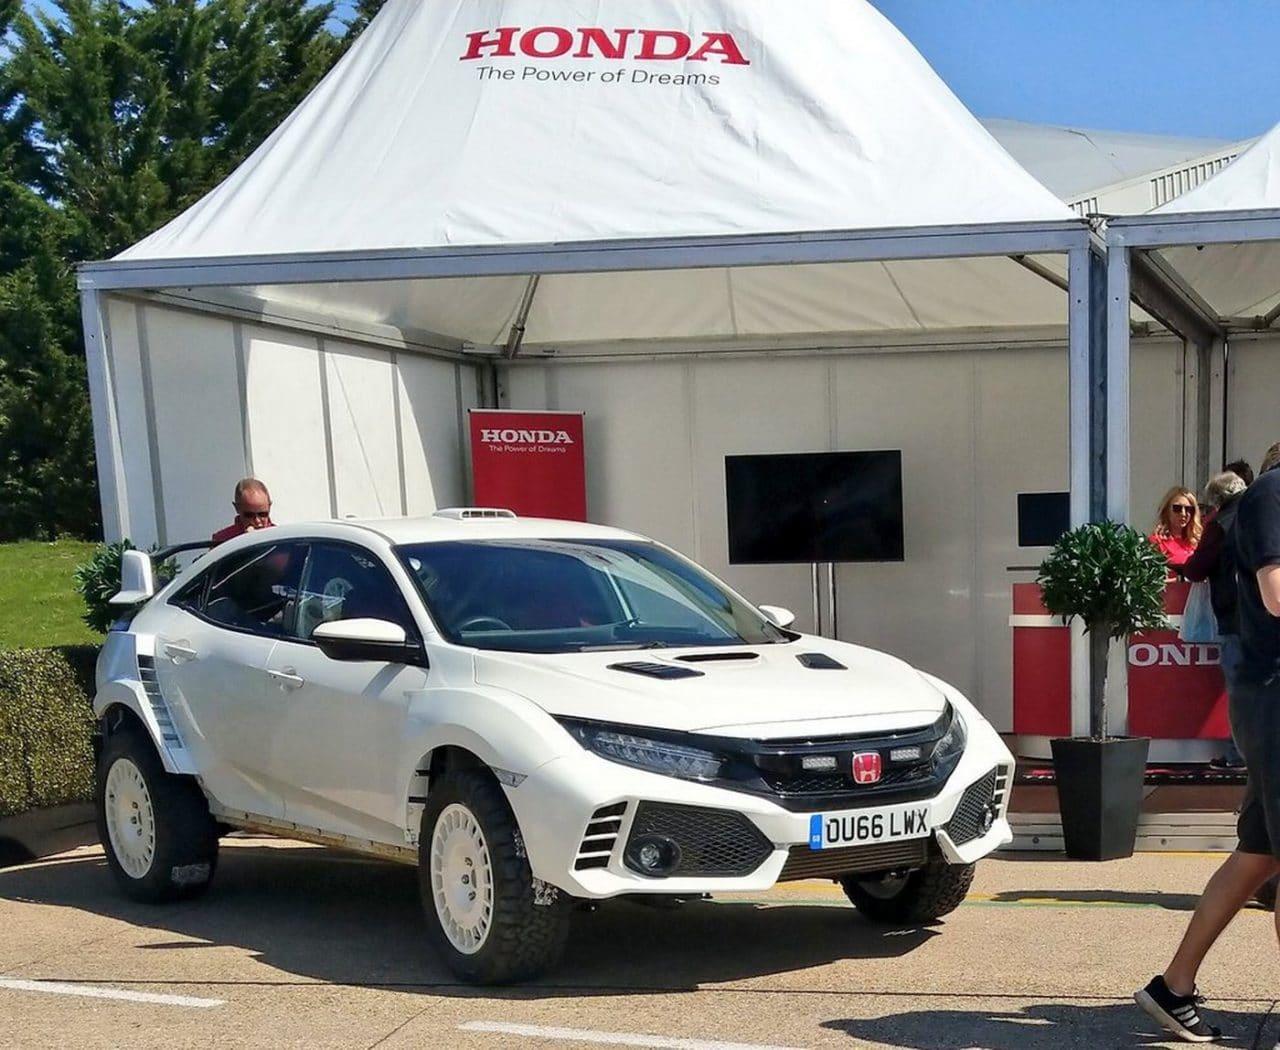 Honda Civic Type R modifiée